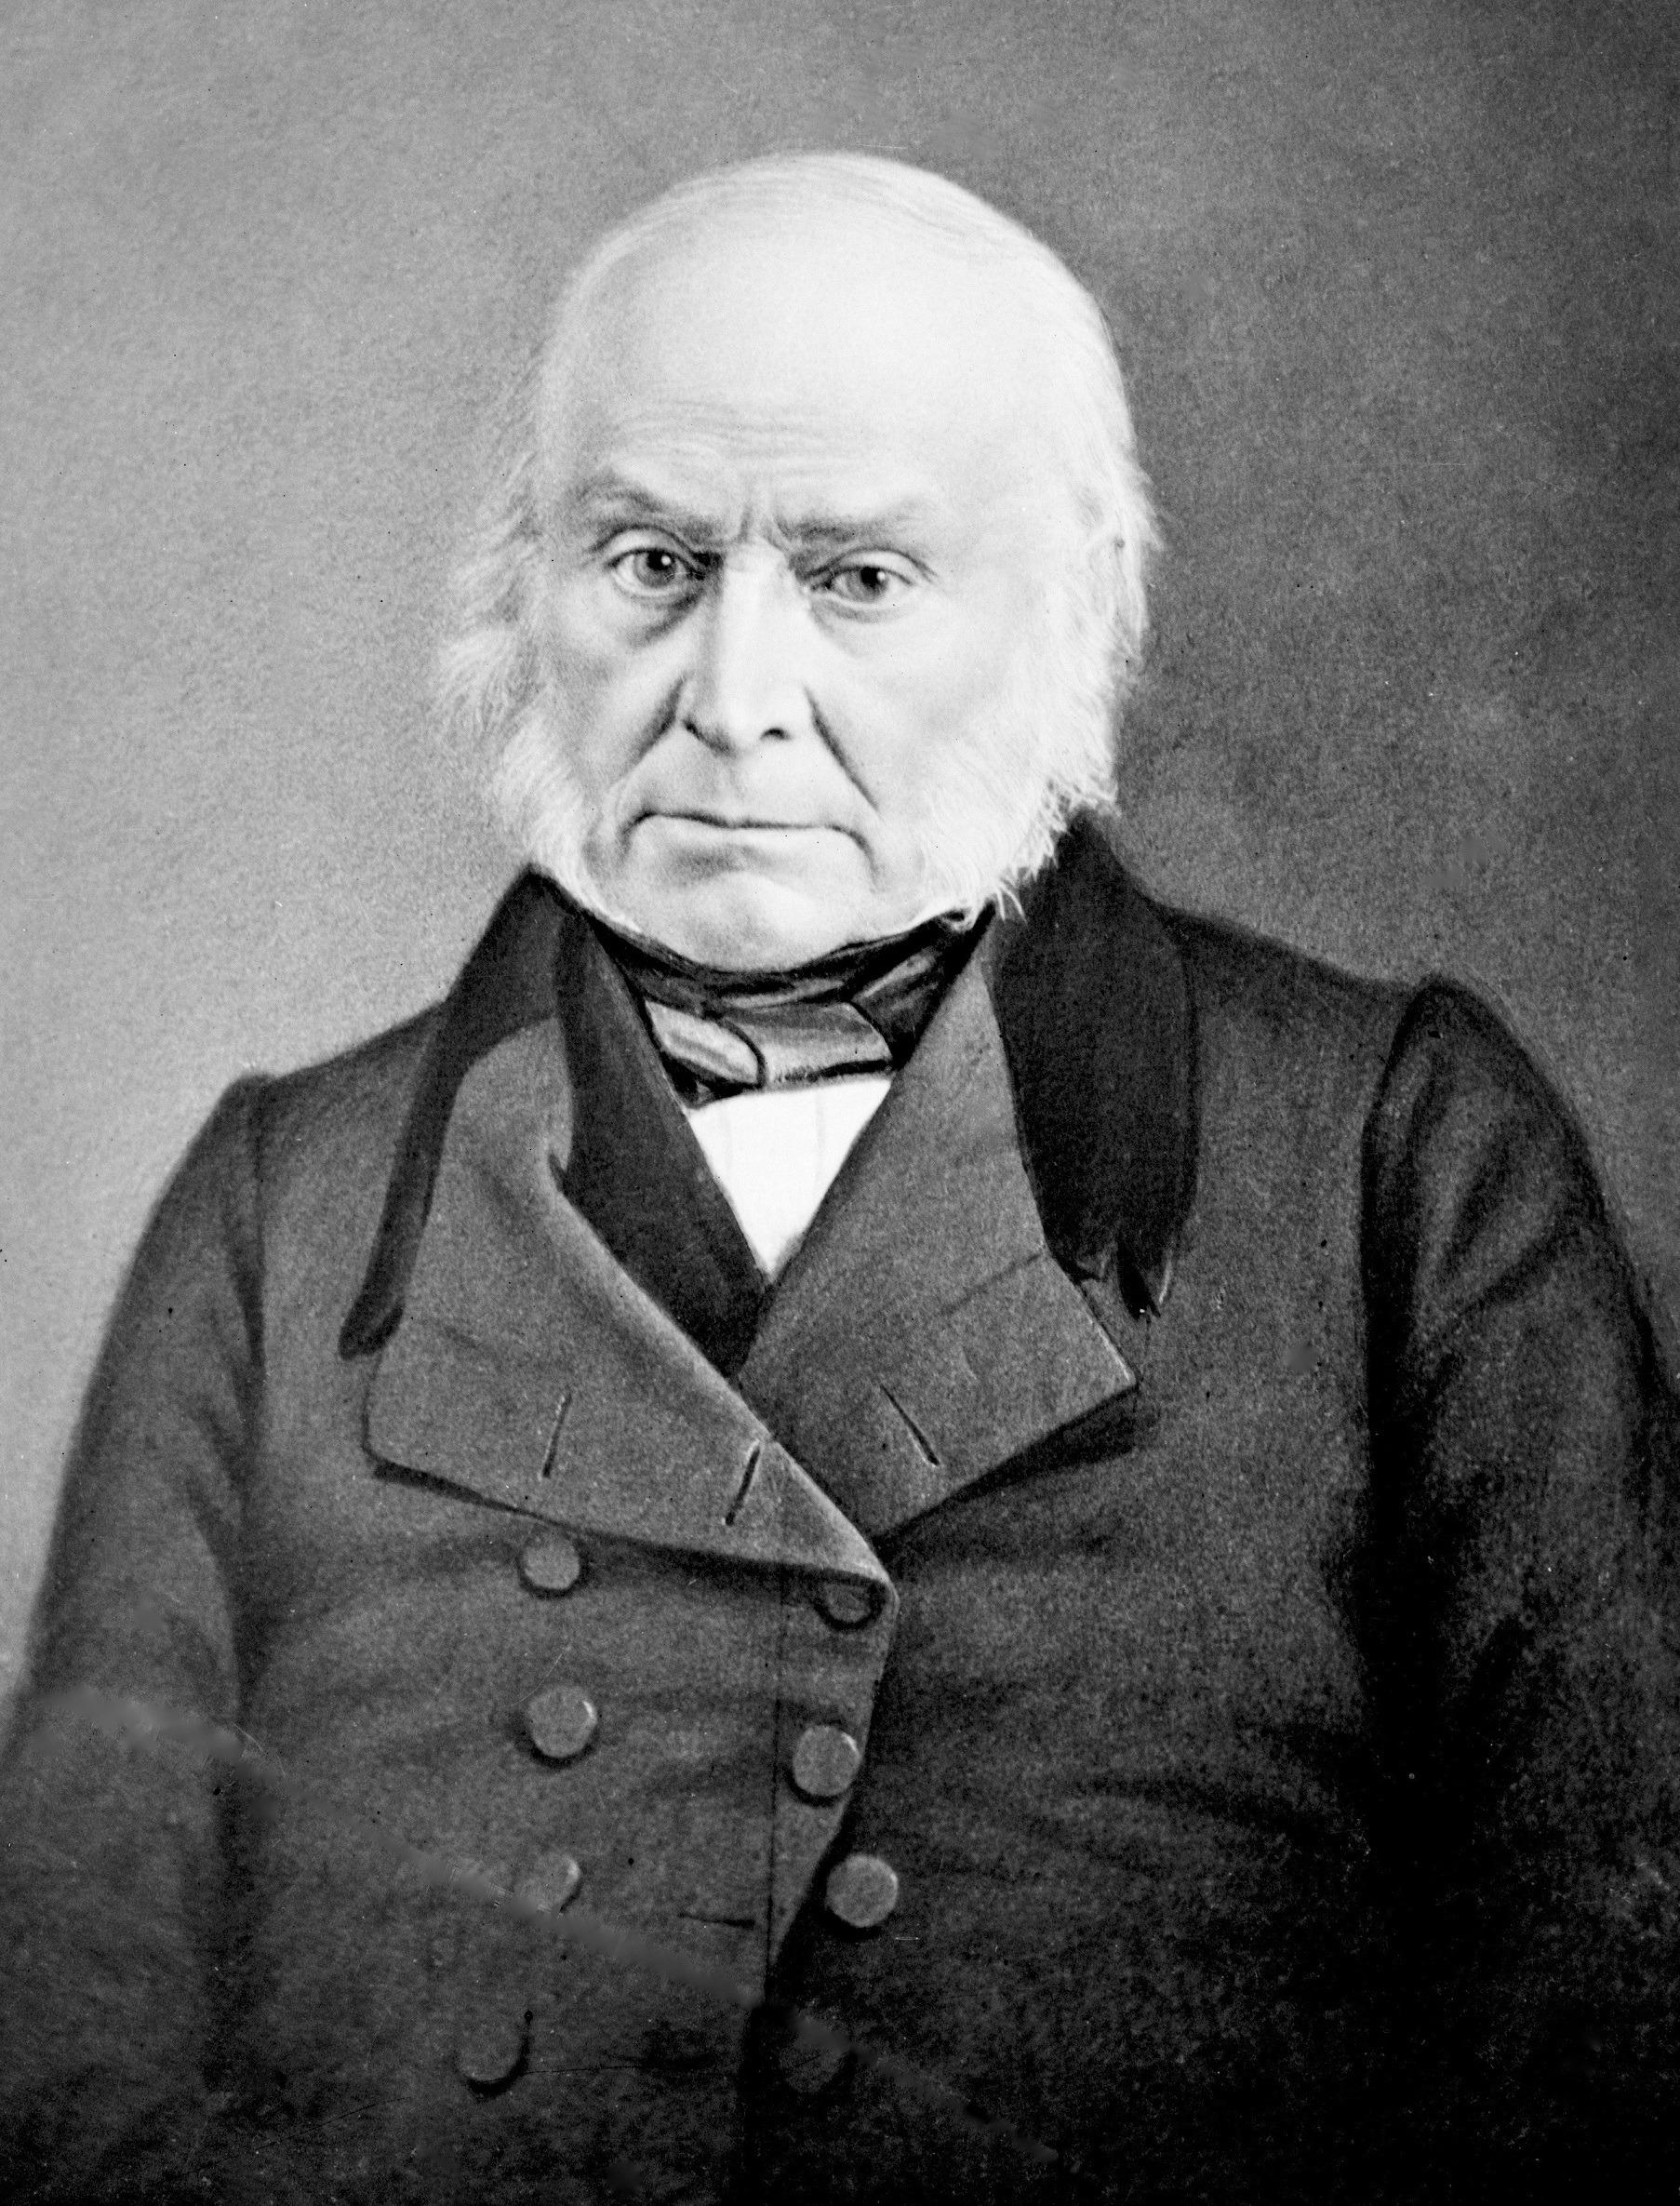 John Quincy Adams, 6th president of the US